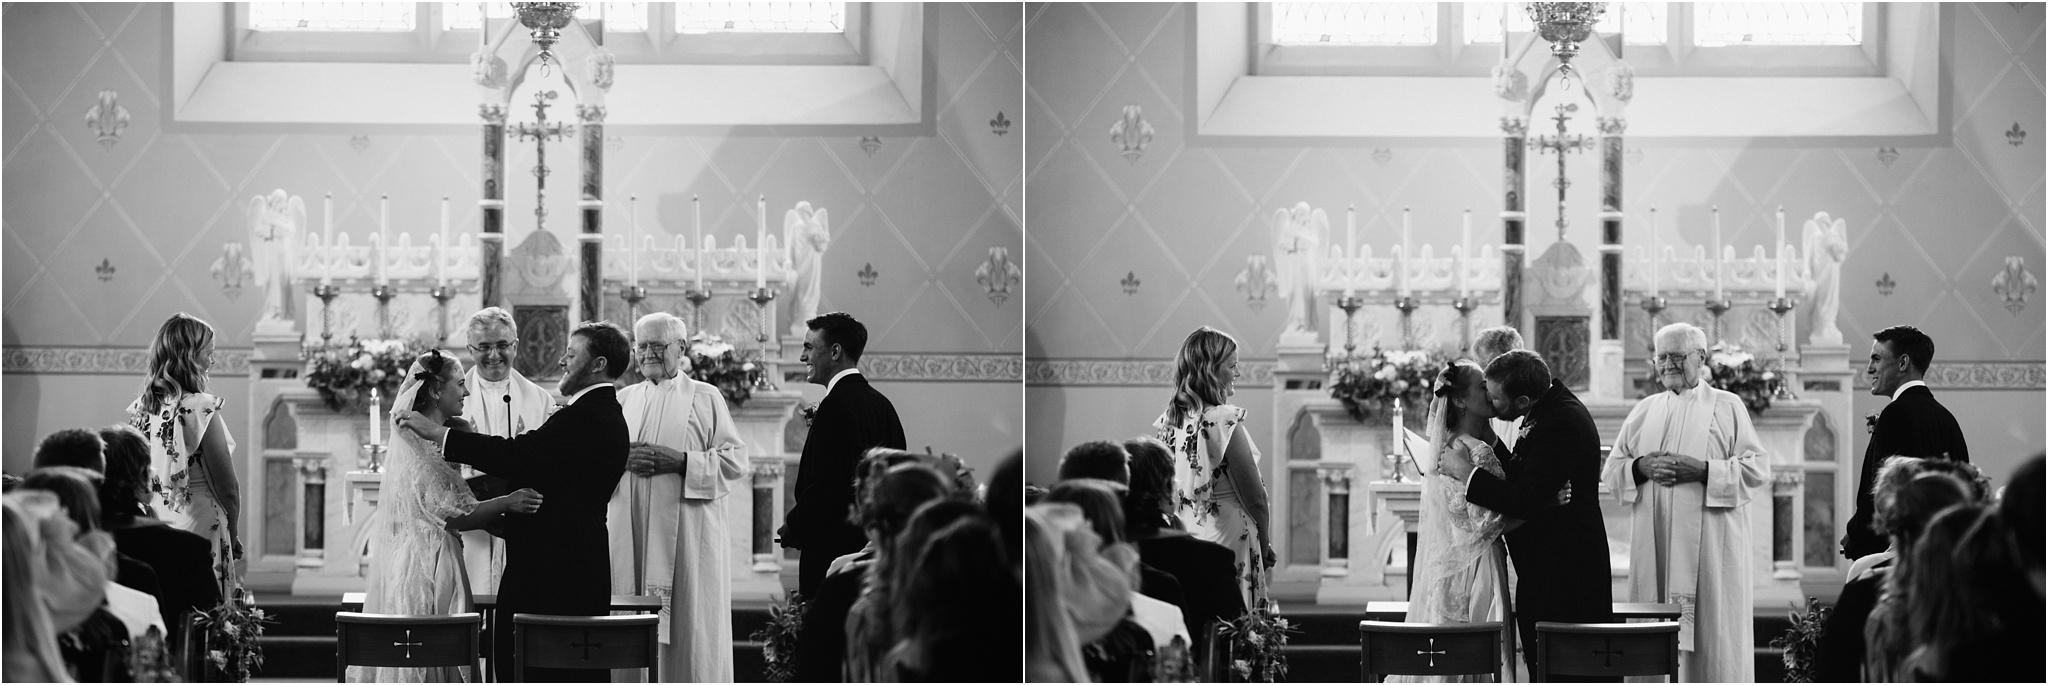 Outdoor-country-wedding-Edinburgh-photographer__0037.jpg